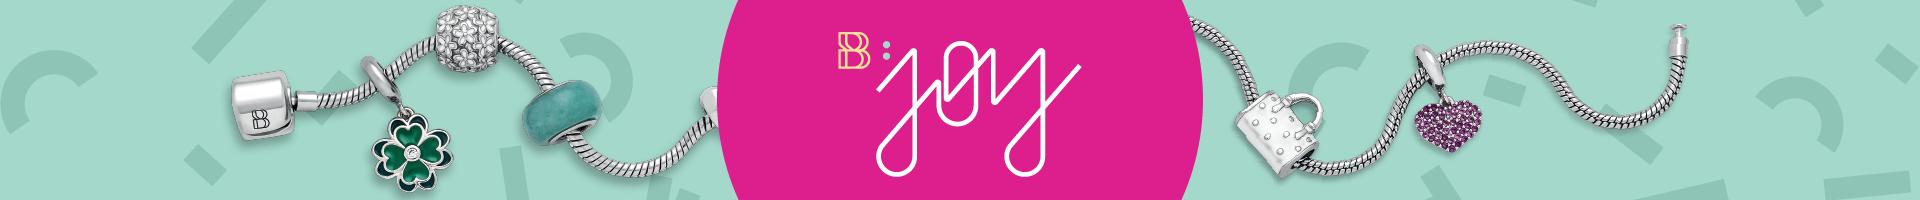 banner_joy